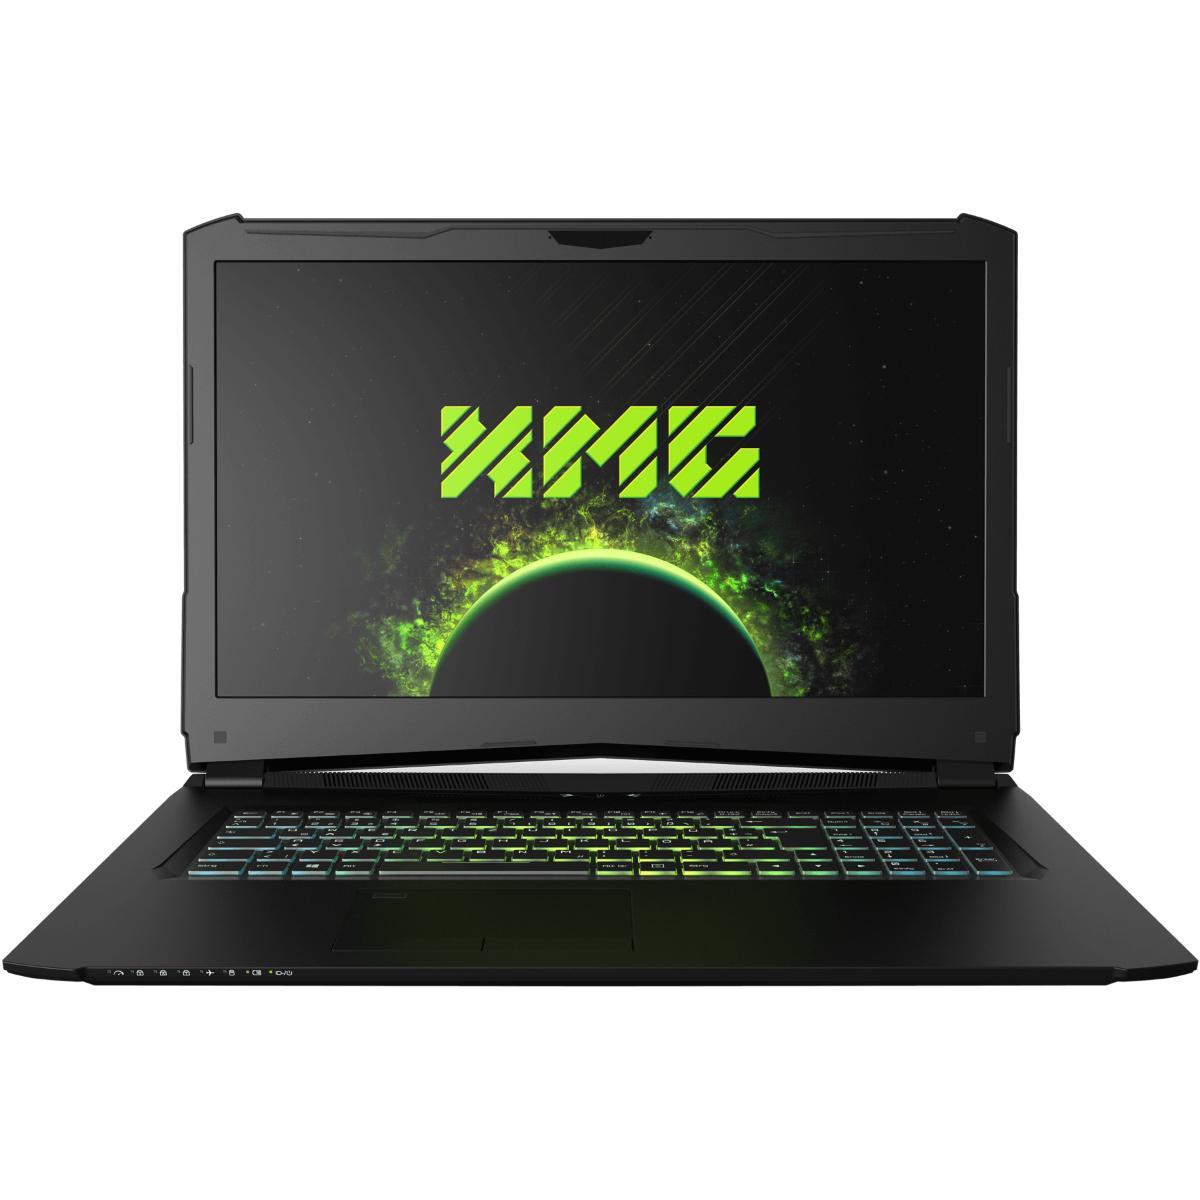 "[bestware.com] Gaming Notebook XMG PRO 17"" i7-8750H 1070 GTX 8GB WQHD G-Sync 120 Hz BT 5.0 Intel Wireless-AC 9260 Einzelstücke"